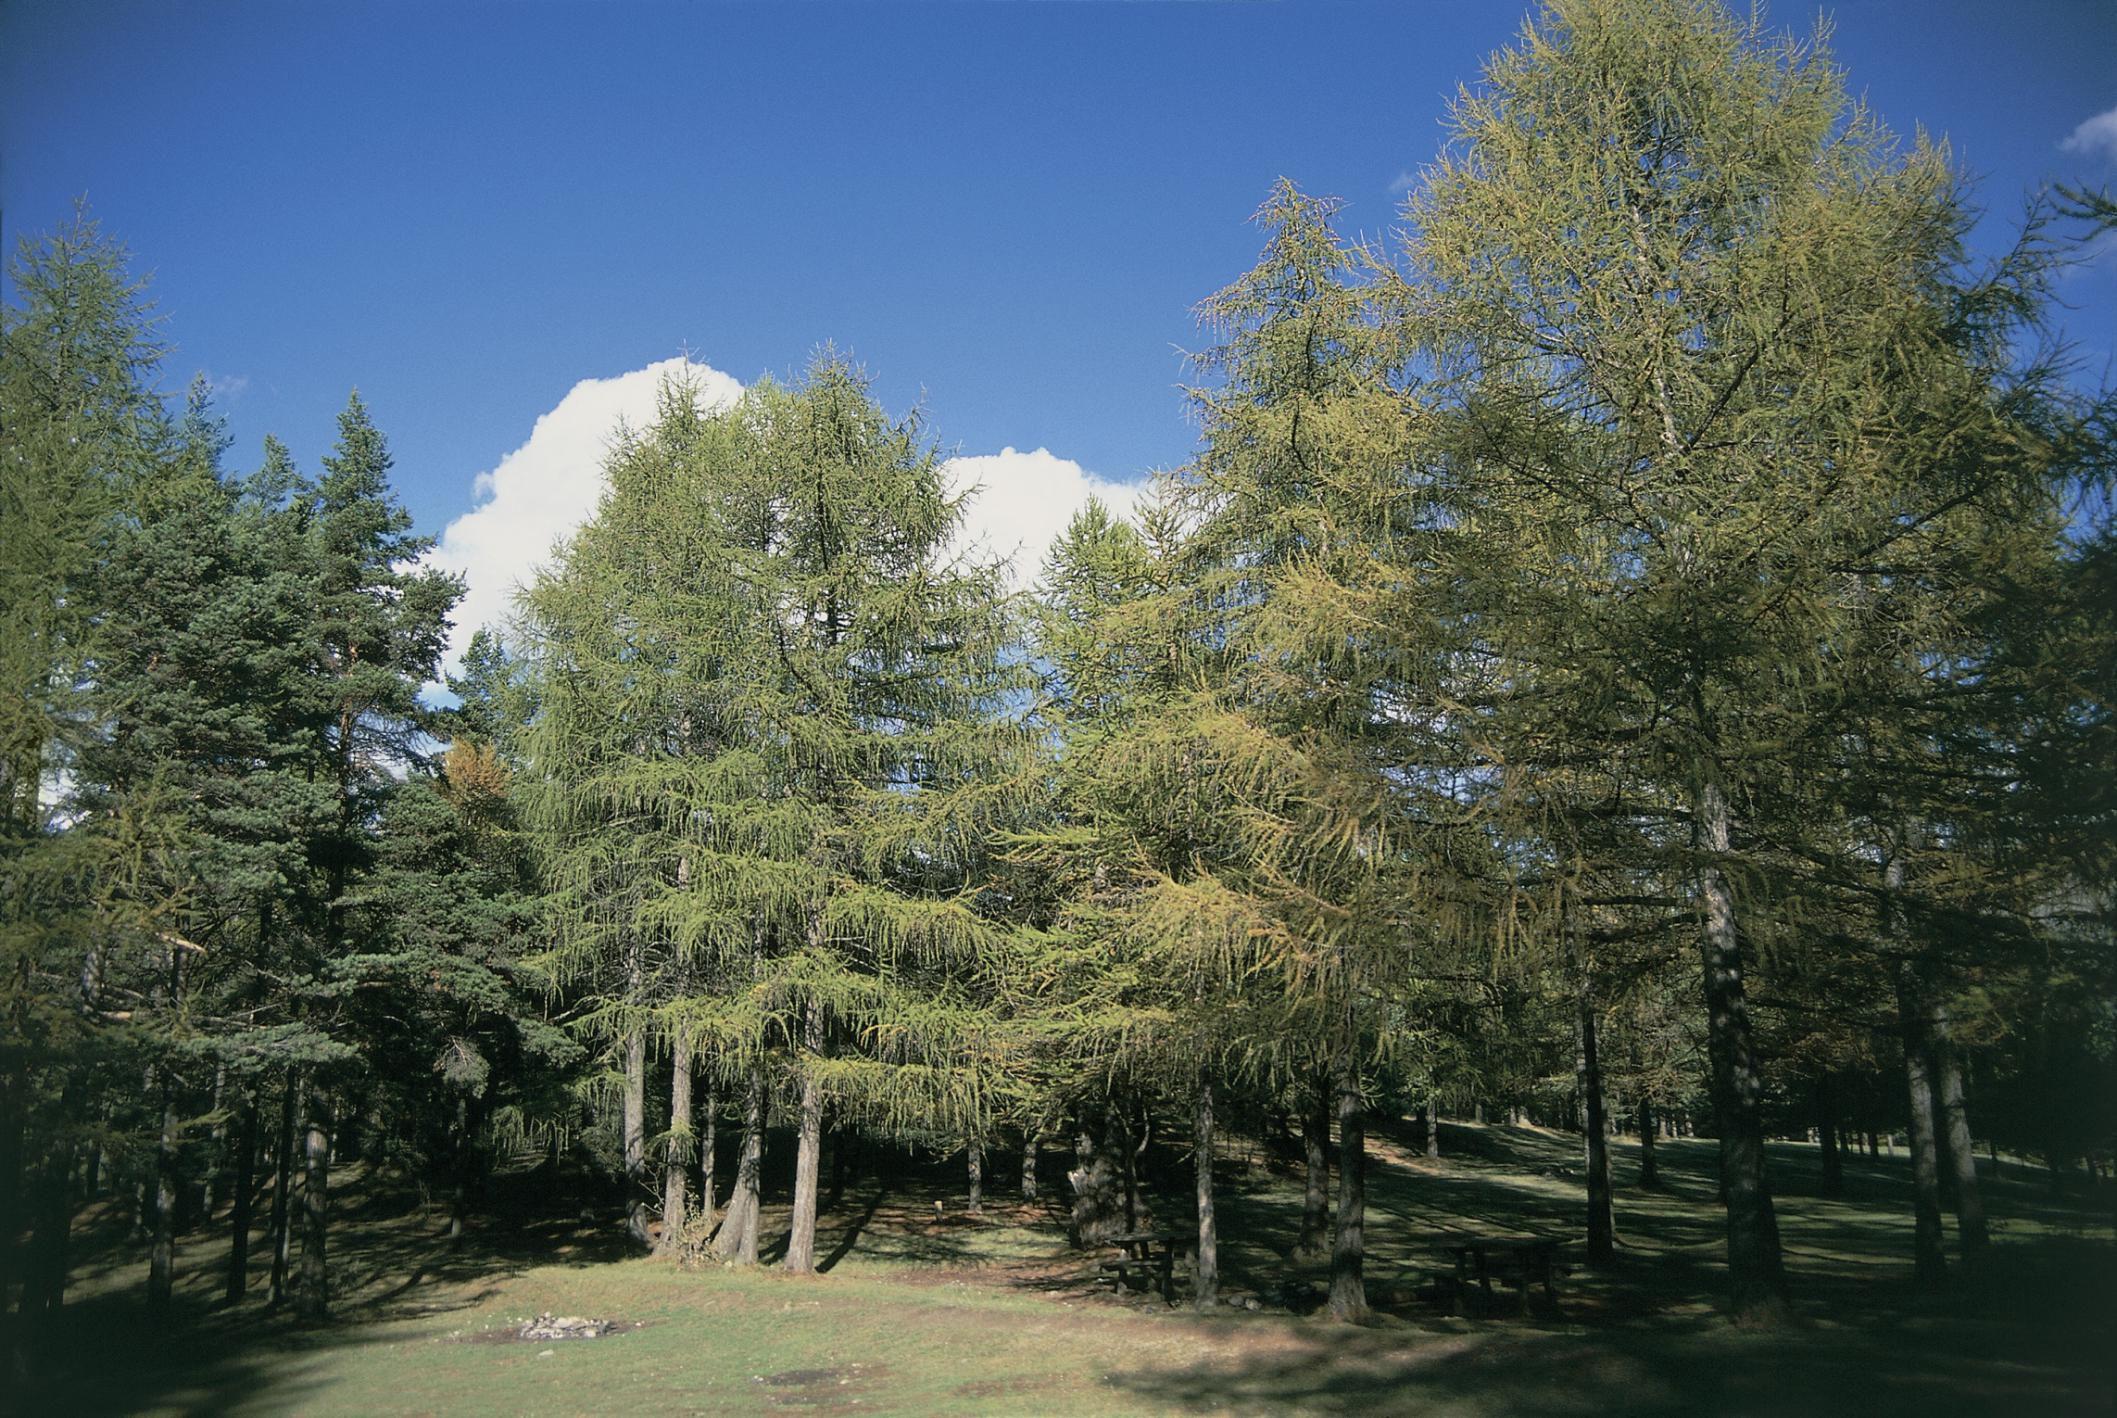 What Are Deciduous Conifers?